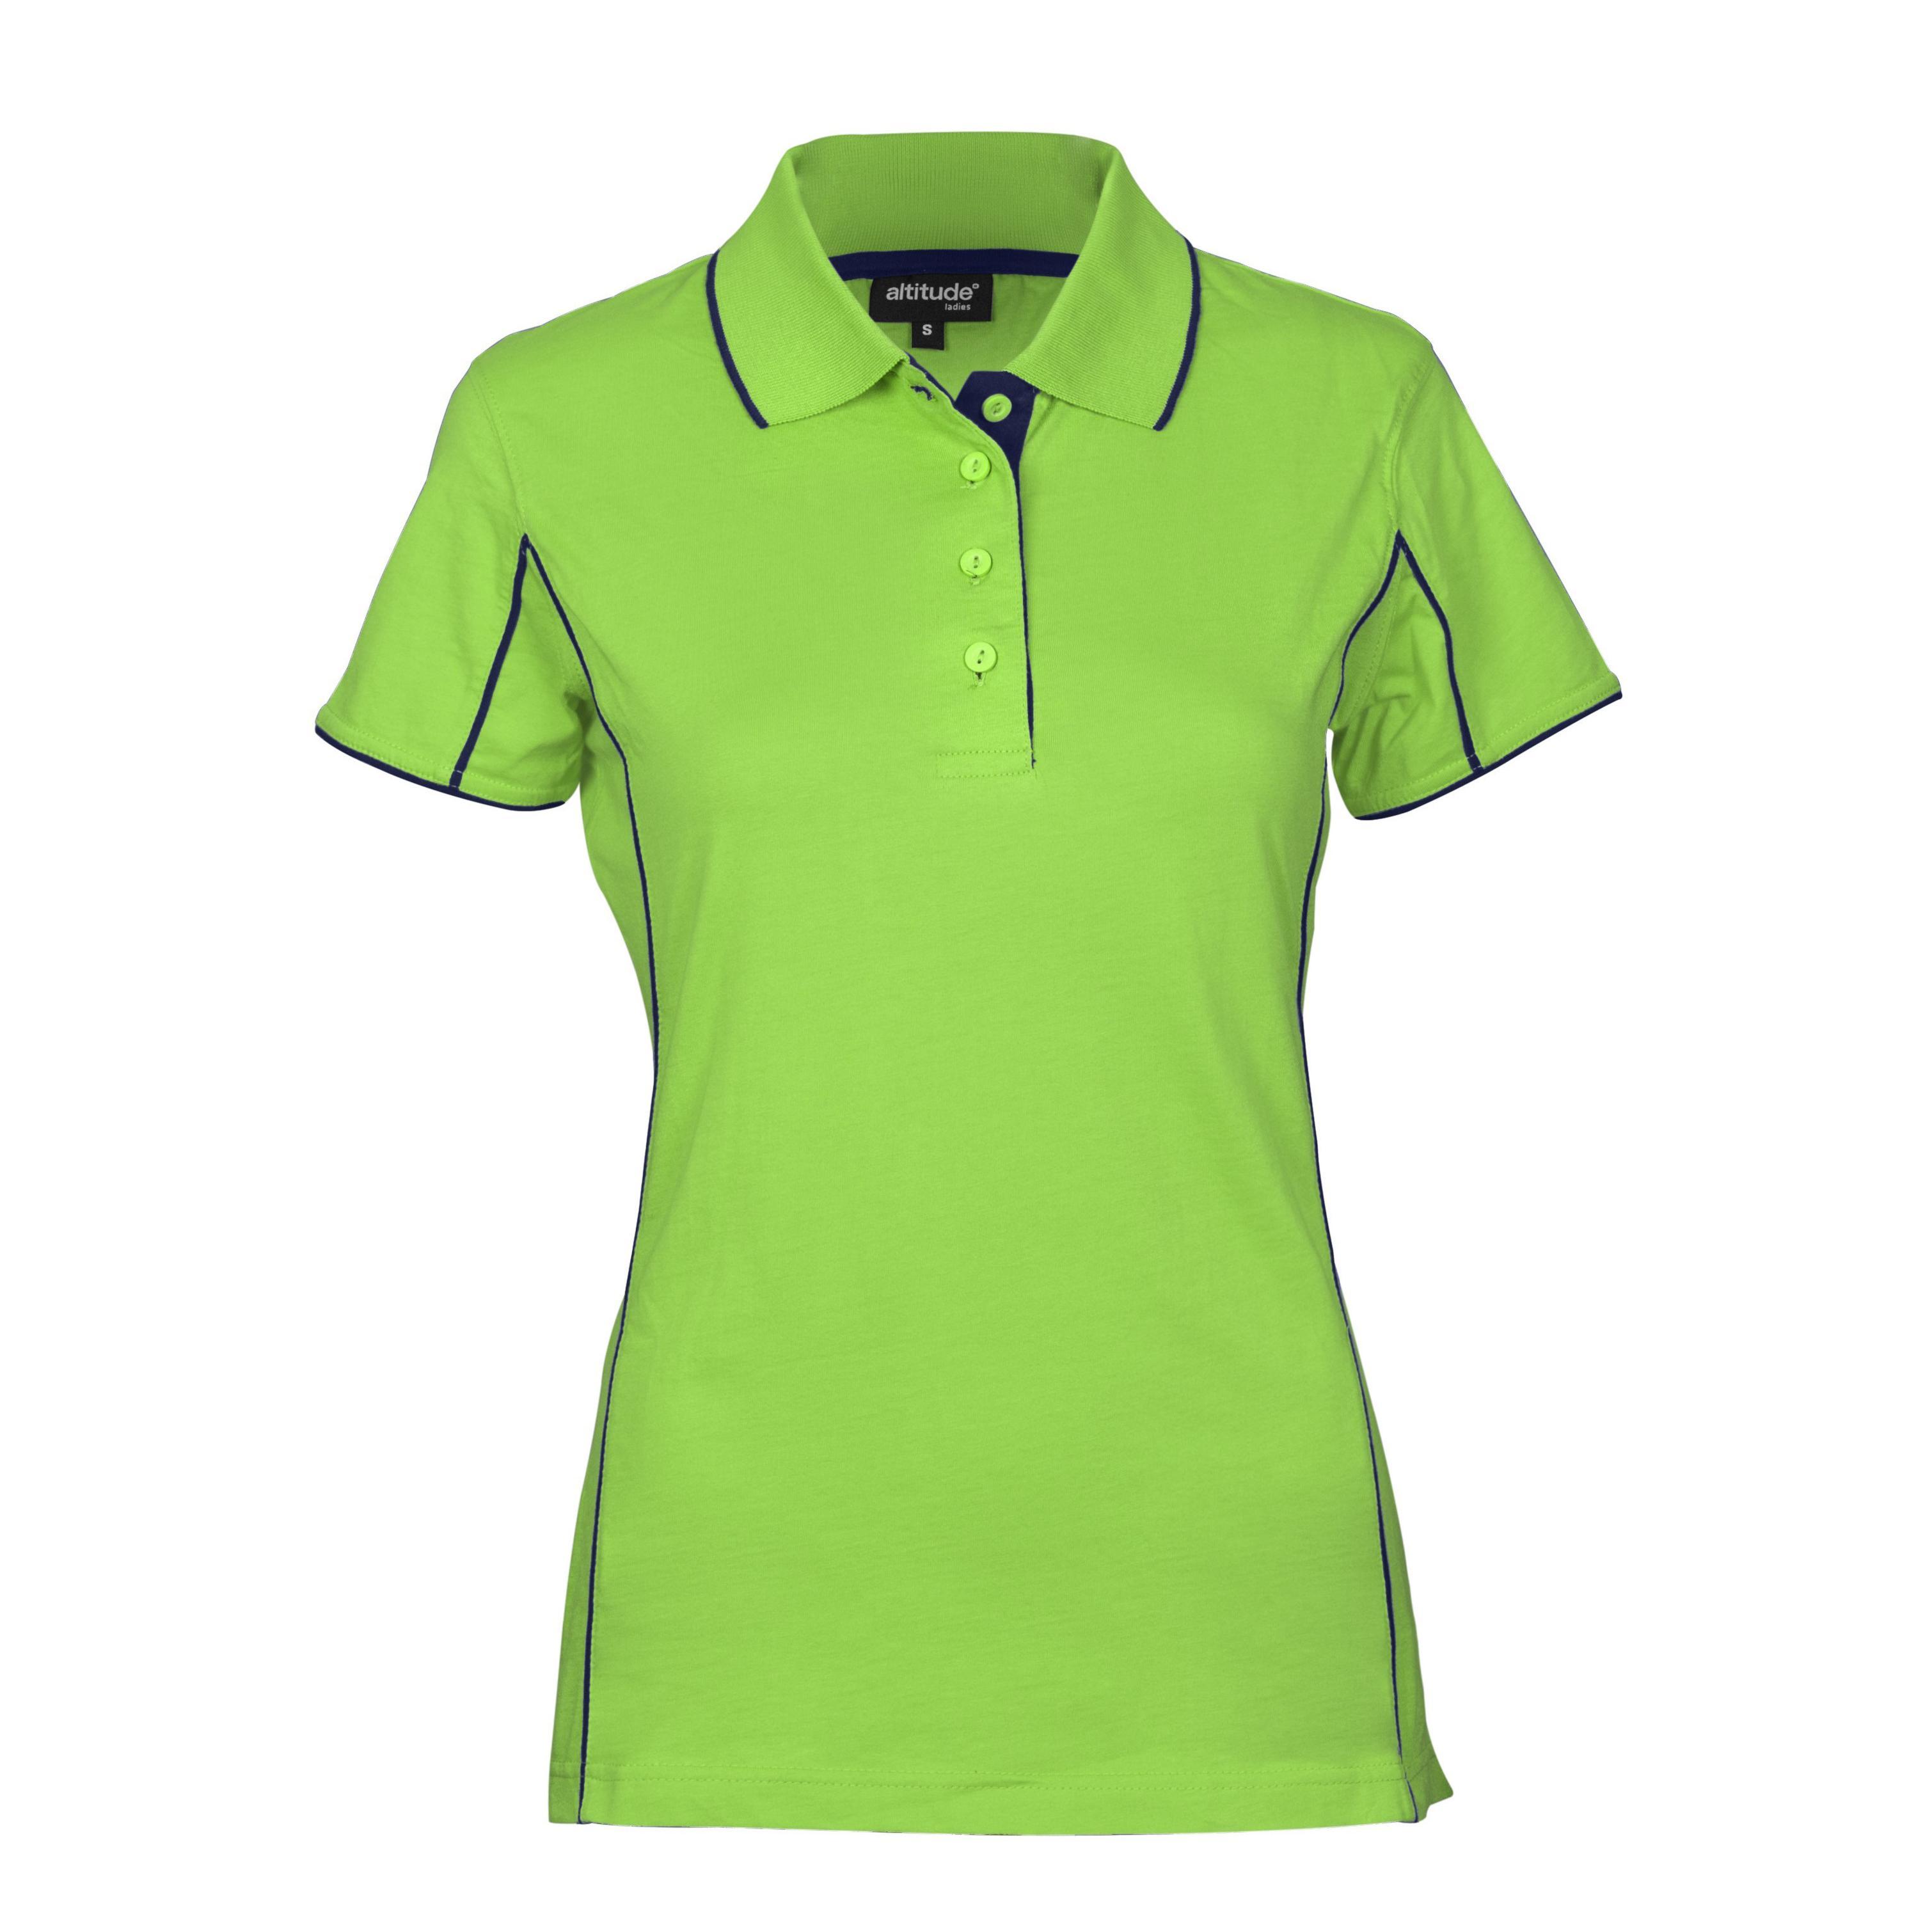 Ladies Denver Golf Shirt - Green Only